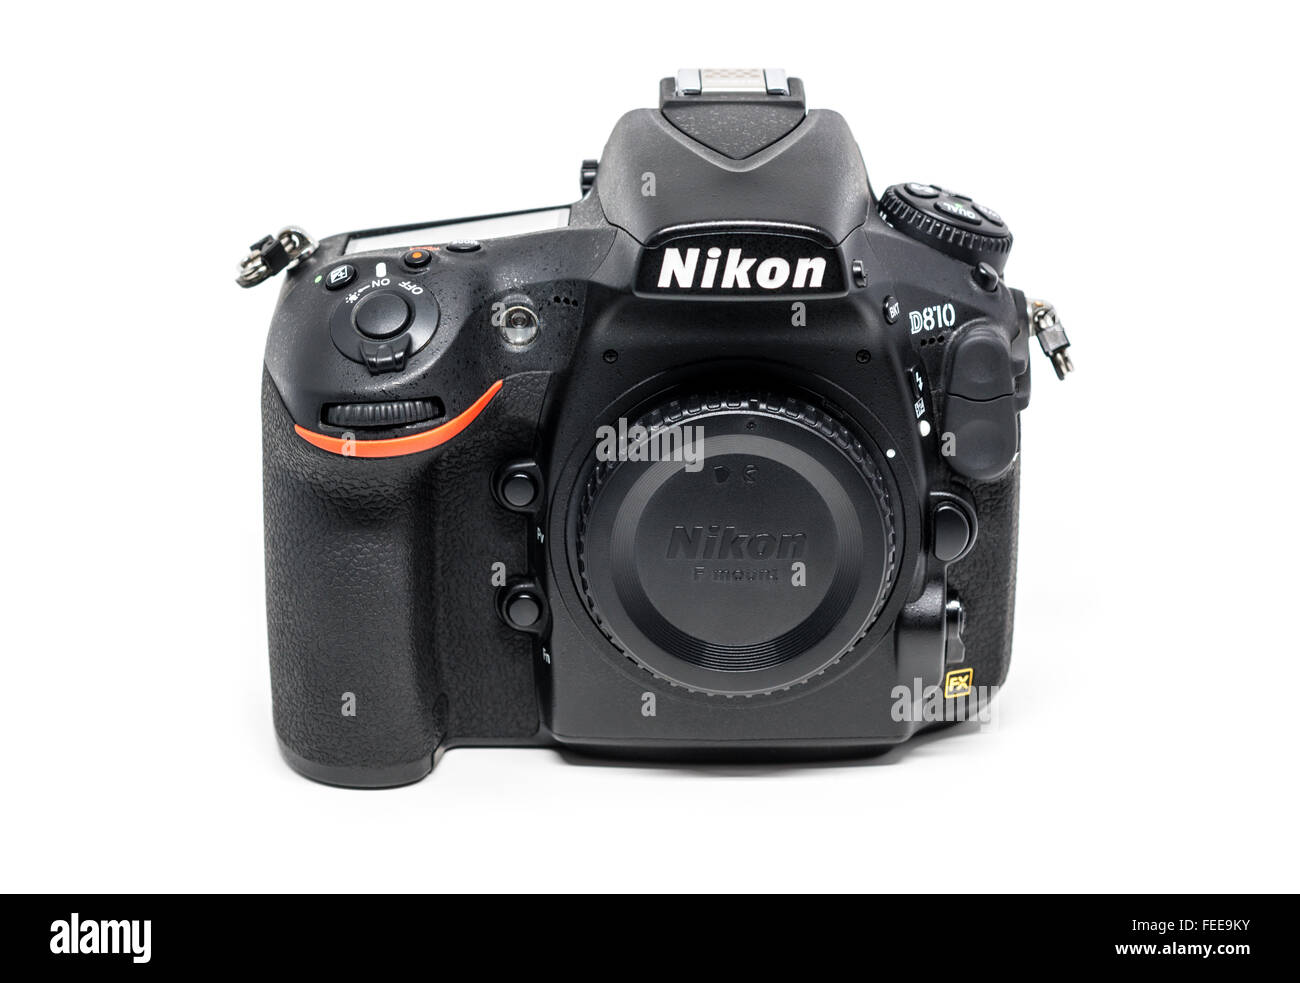 OSTFILDERN, GERMANY - JANUARY 24, 2016: A Nikon D810 camera body without lens, the first digital SLR camera in Nikon's - Stock Image